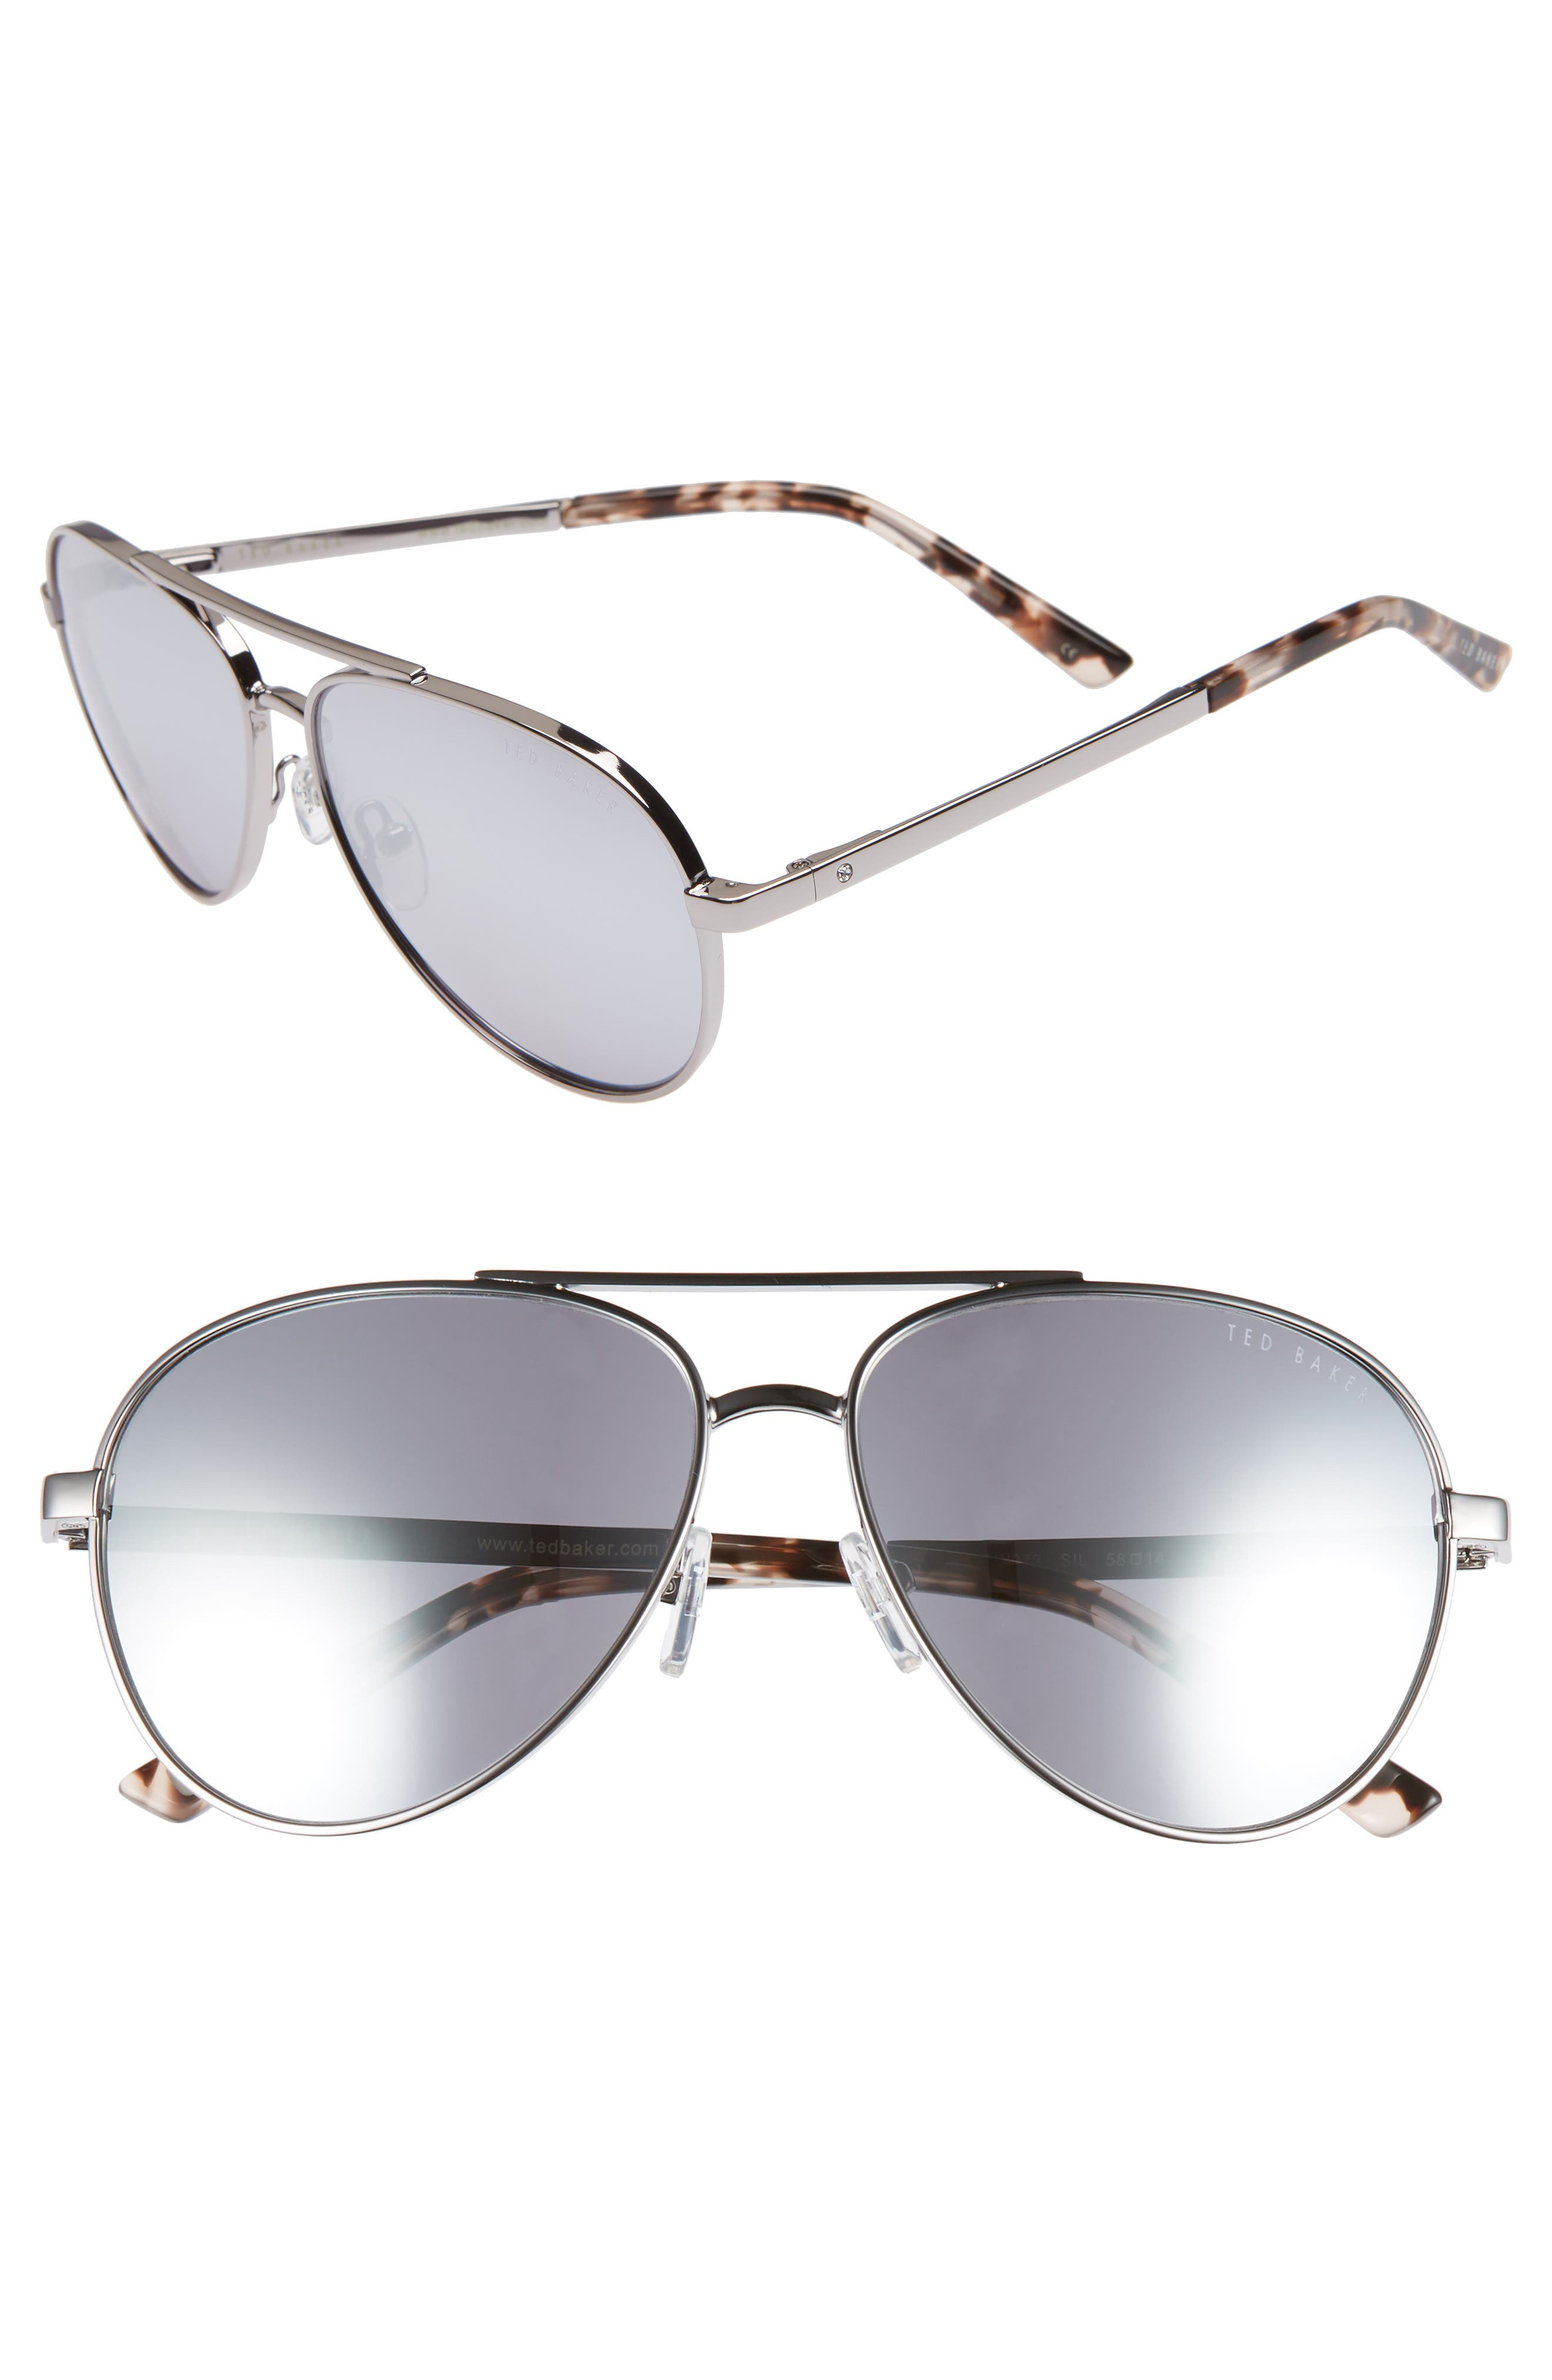 58mm Aviator Sunglasses,                         Main,                         color, SILVER